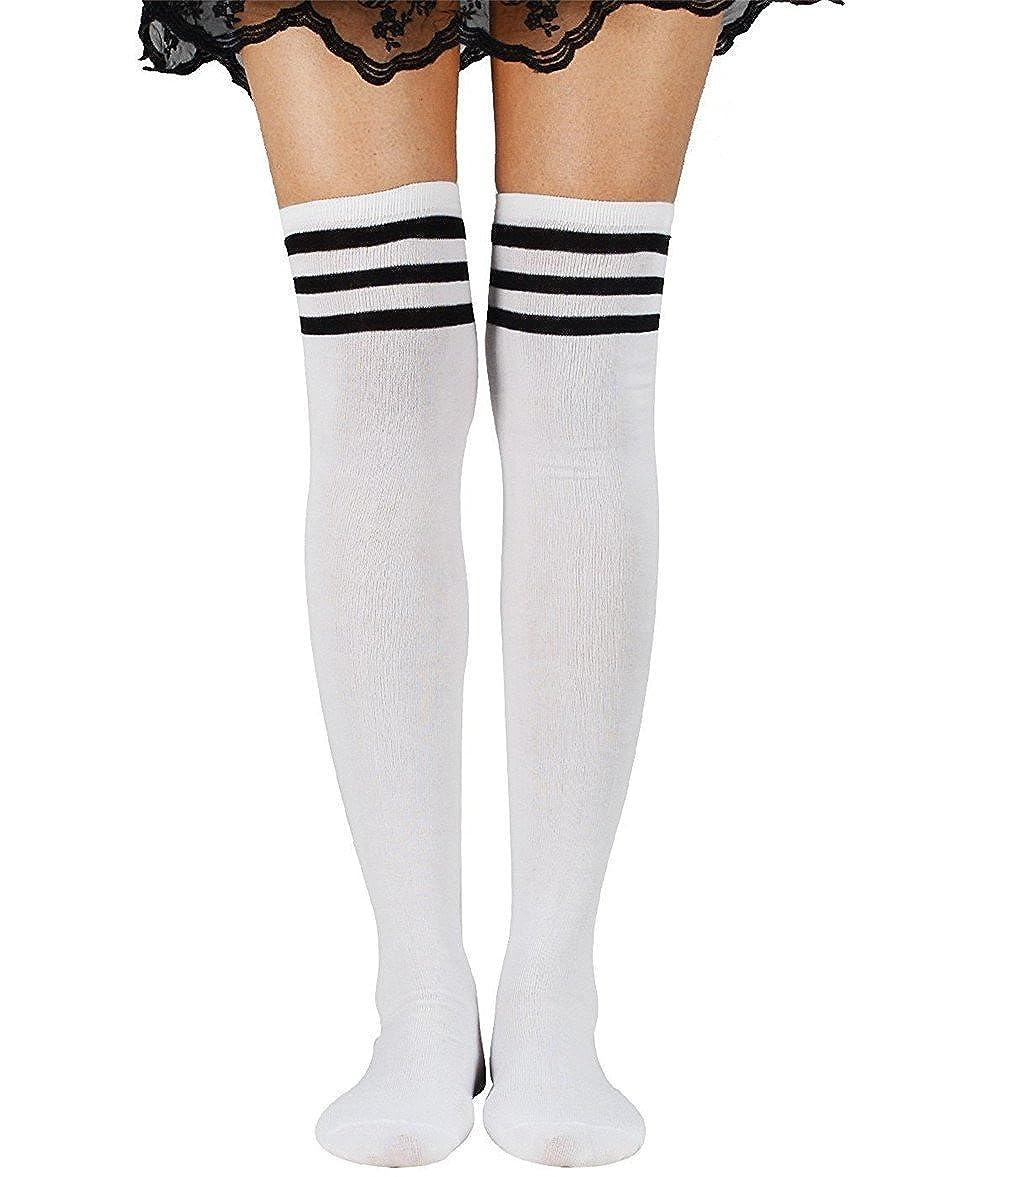 Kfnire 2PCS calze da donna con calzettoni in cotone a righe infradito calze a tre coste con calzamaglia lunga e morbida